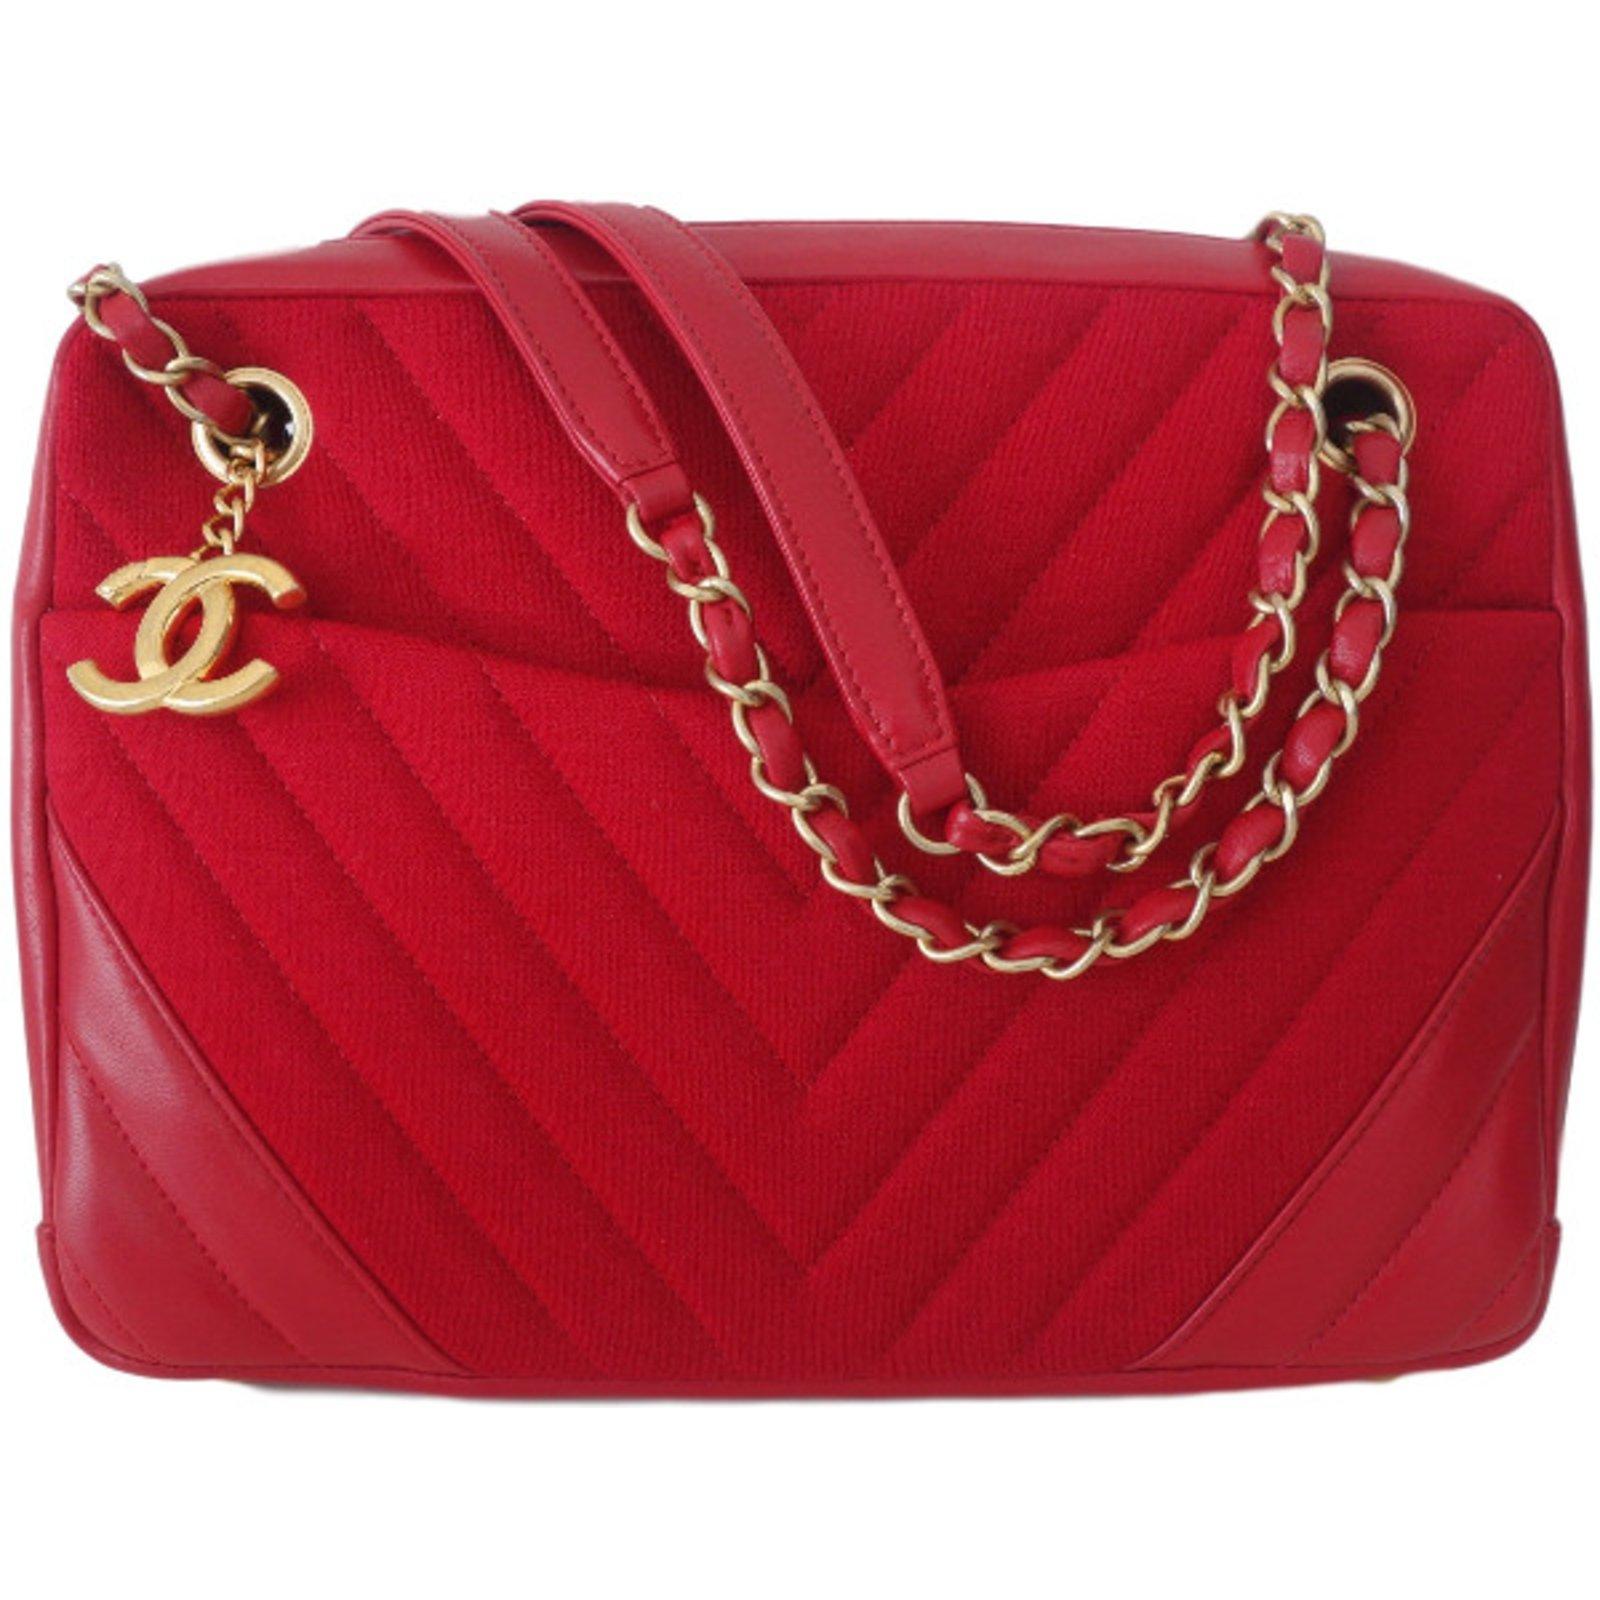 Chanel Handbag Handbags Leather Red Ref 36386